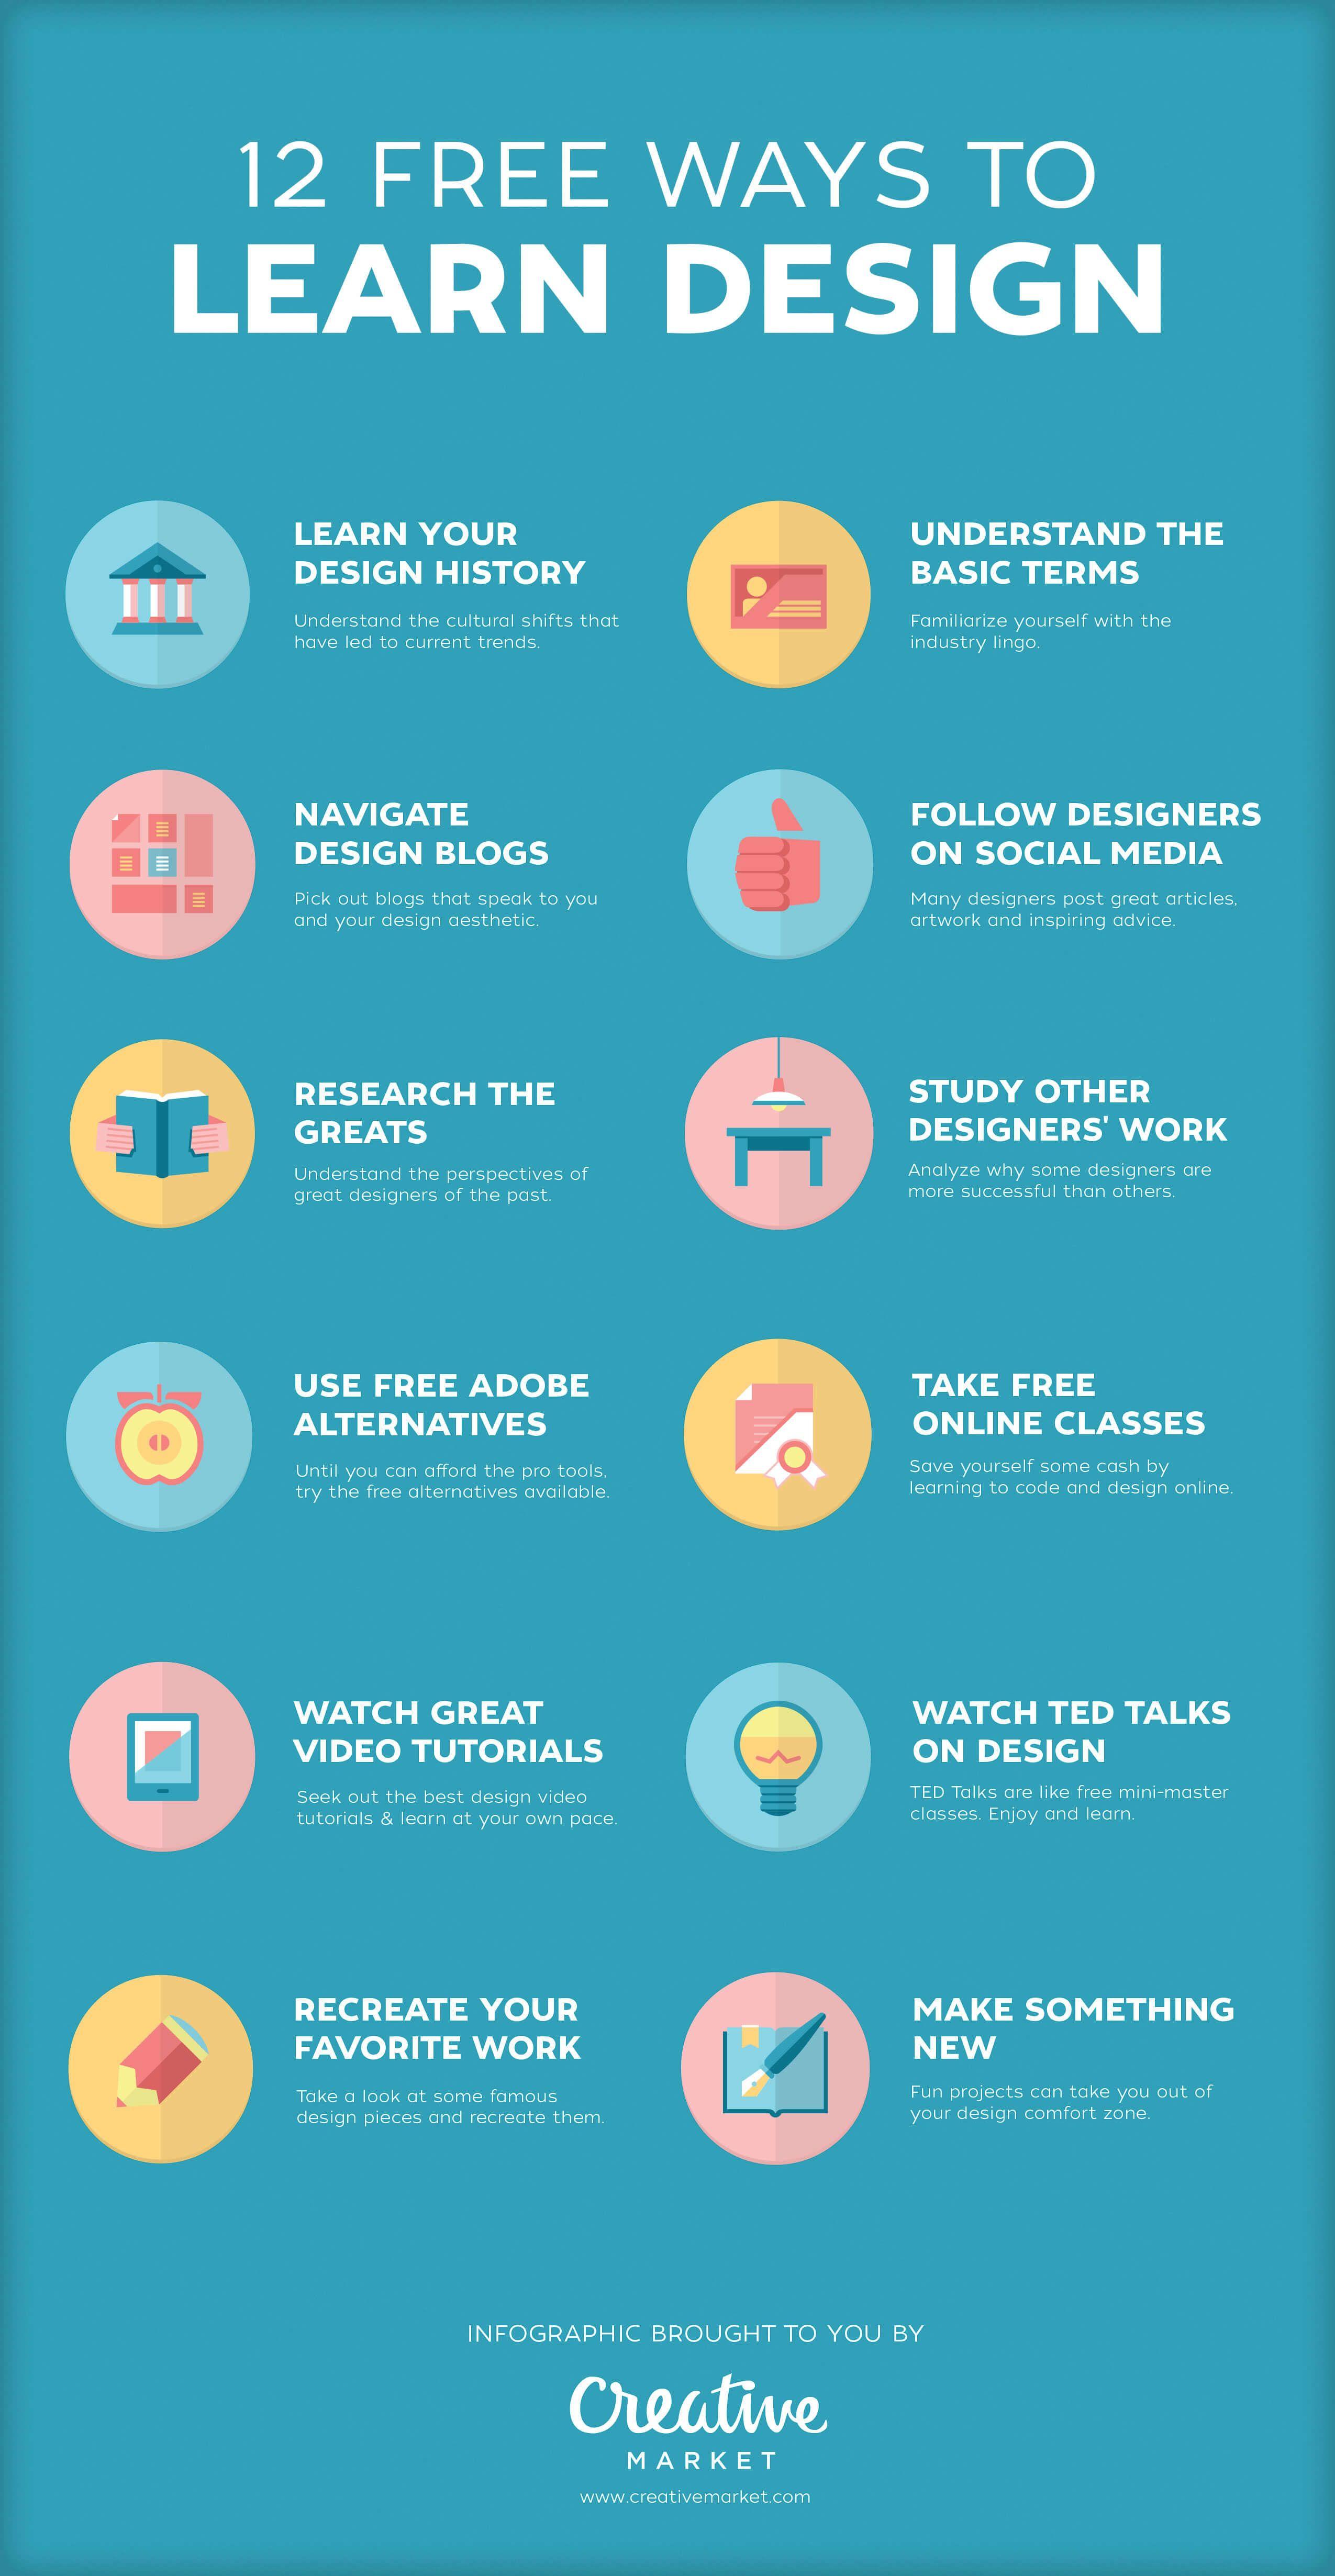 learn design online for